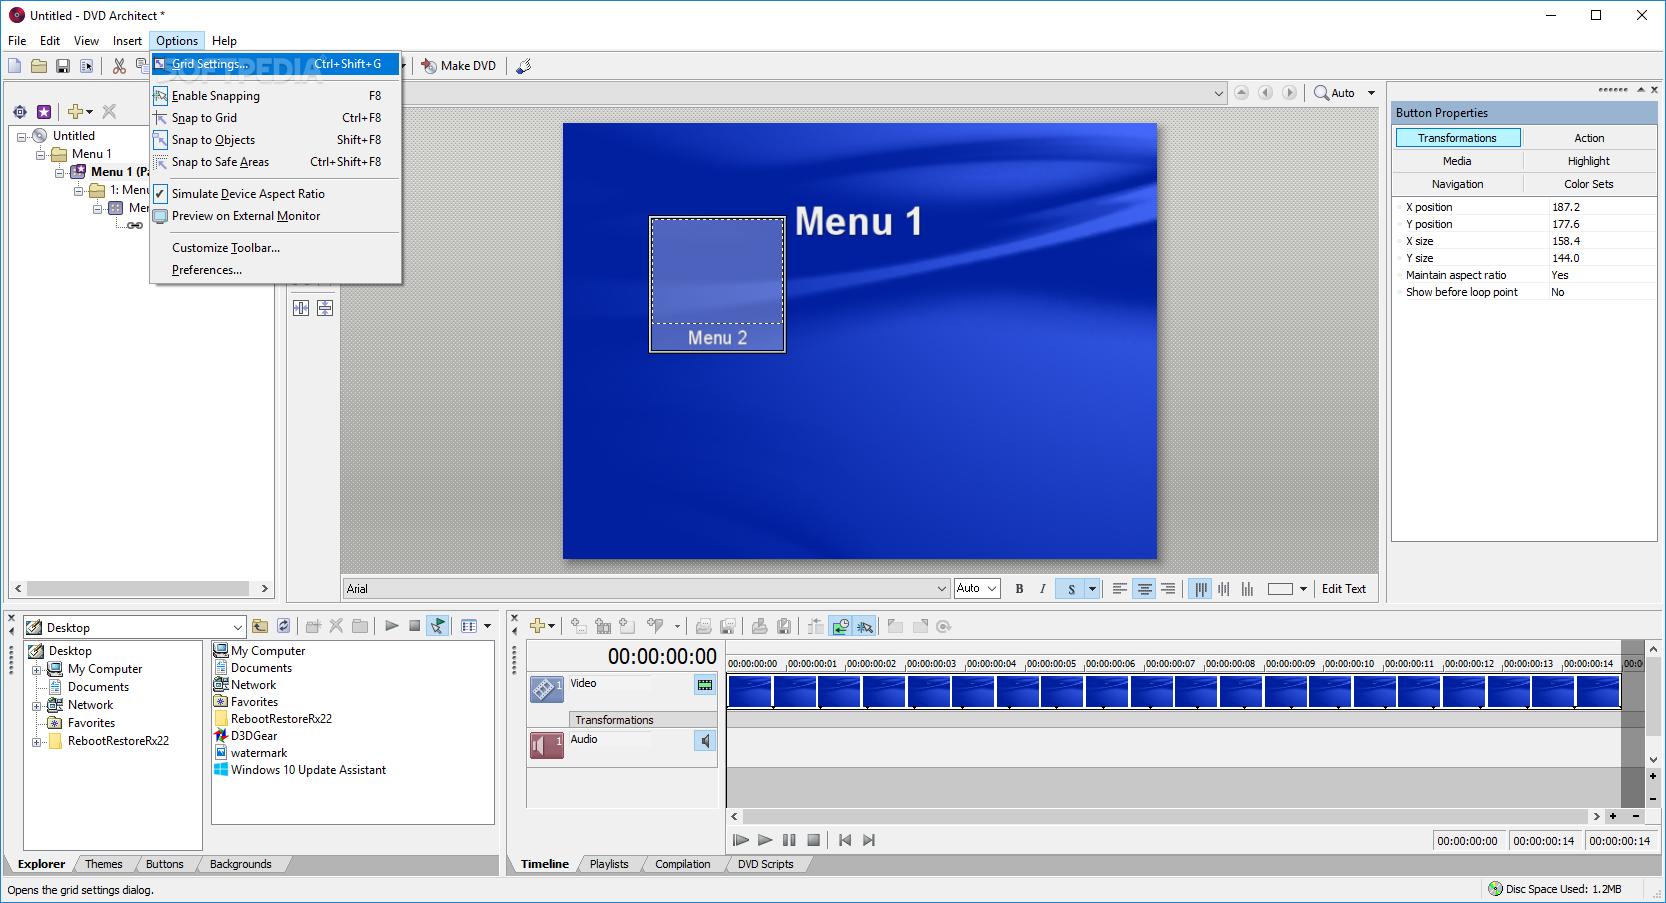 download vegas dvd architect 7 0 build 84 rh softpedia com Sony DVD Architect Menu With Sony Vegas DVD Architect